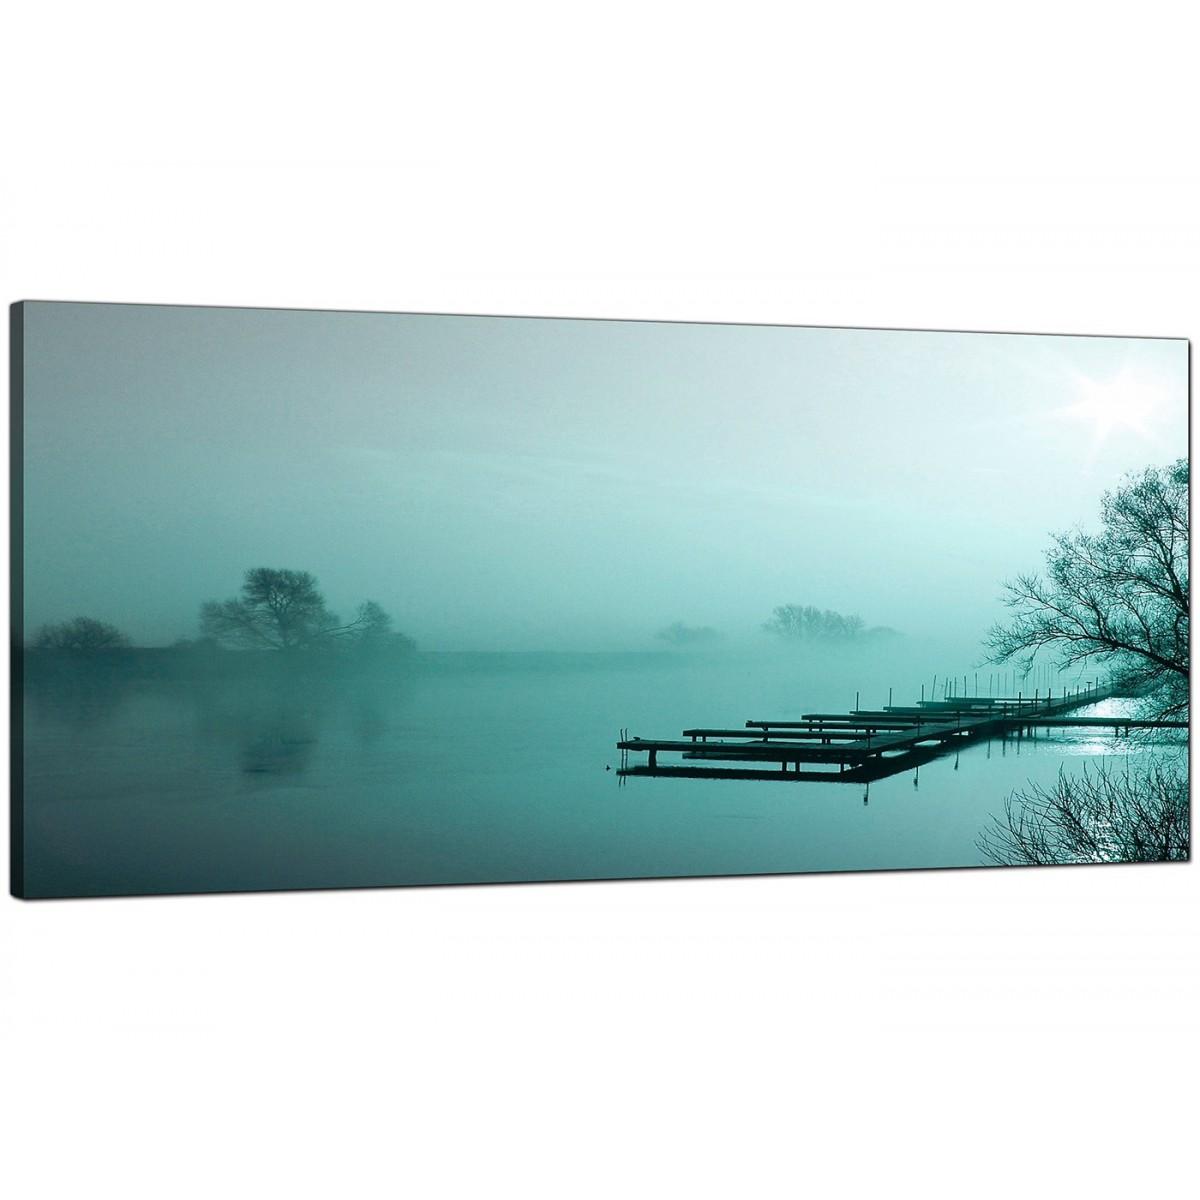 large teal canvas art of a river landscape